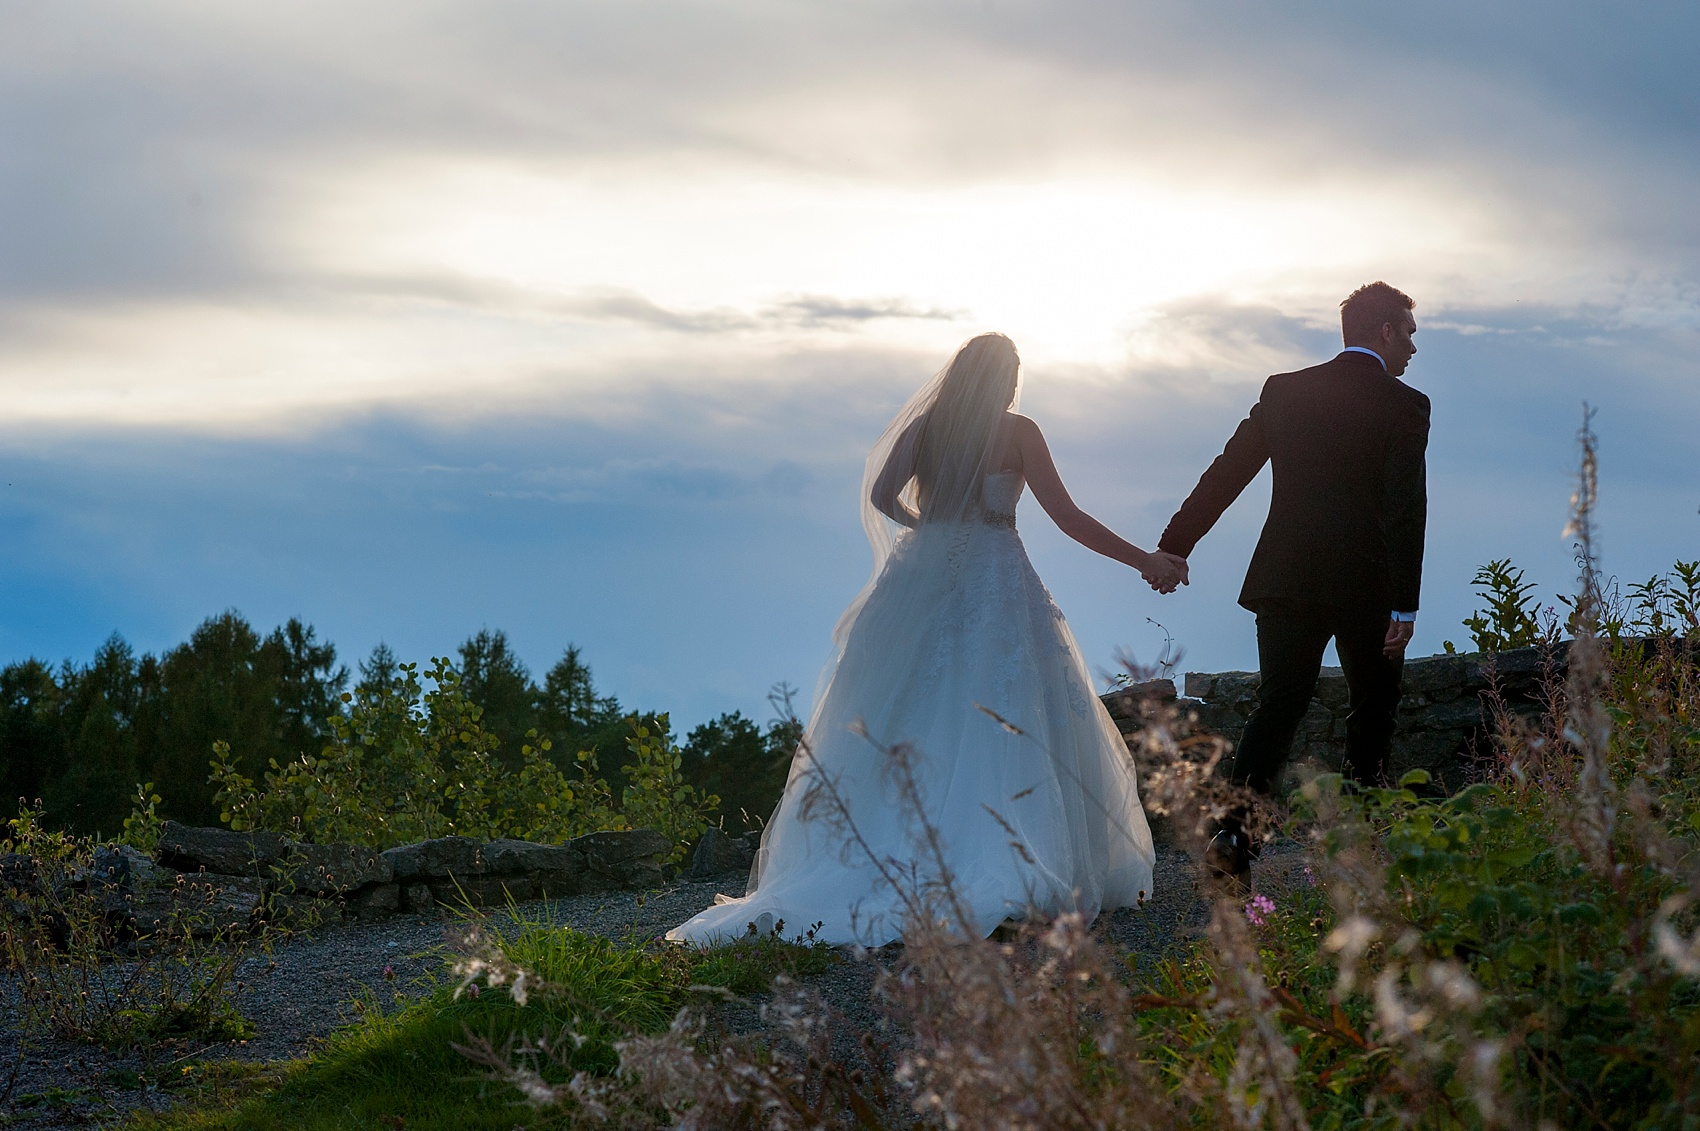 alvoen wedding bergen norway photos cecilie patrick. Black Bedroom Furniture Sets. Home Design Ideas